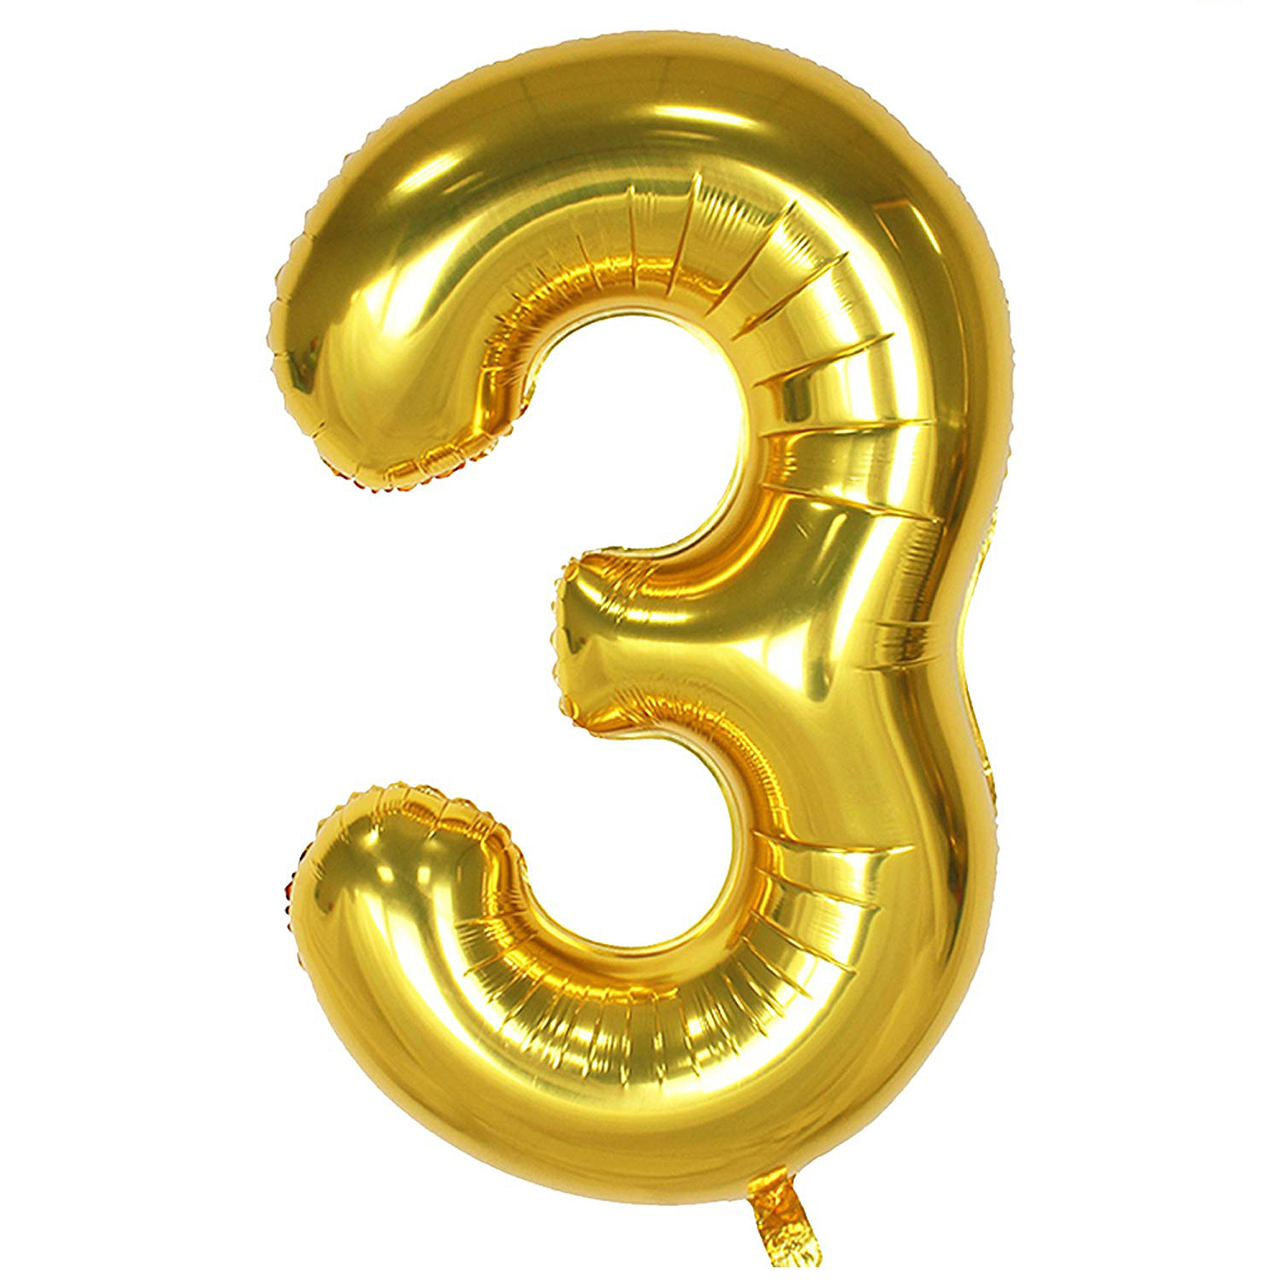 بادکنک فویلی عدد 3 هپی بری طلایی سایز 32 اینچ سایز 120